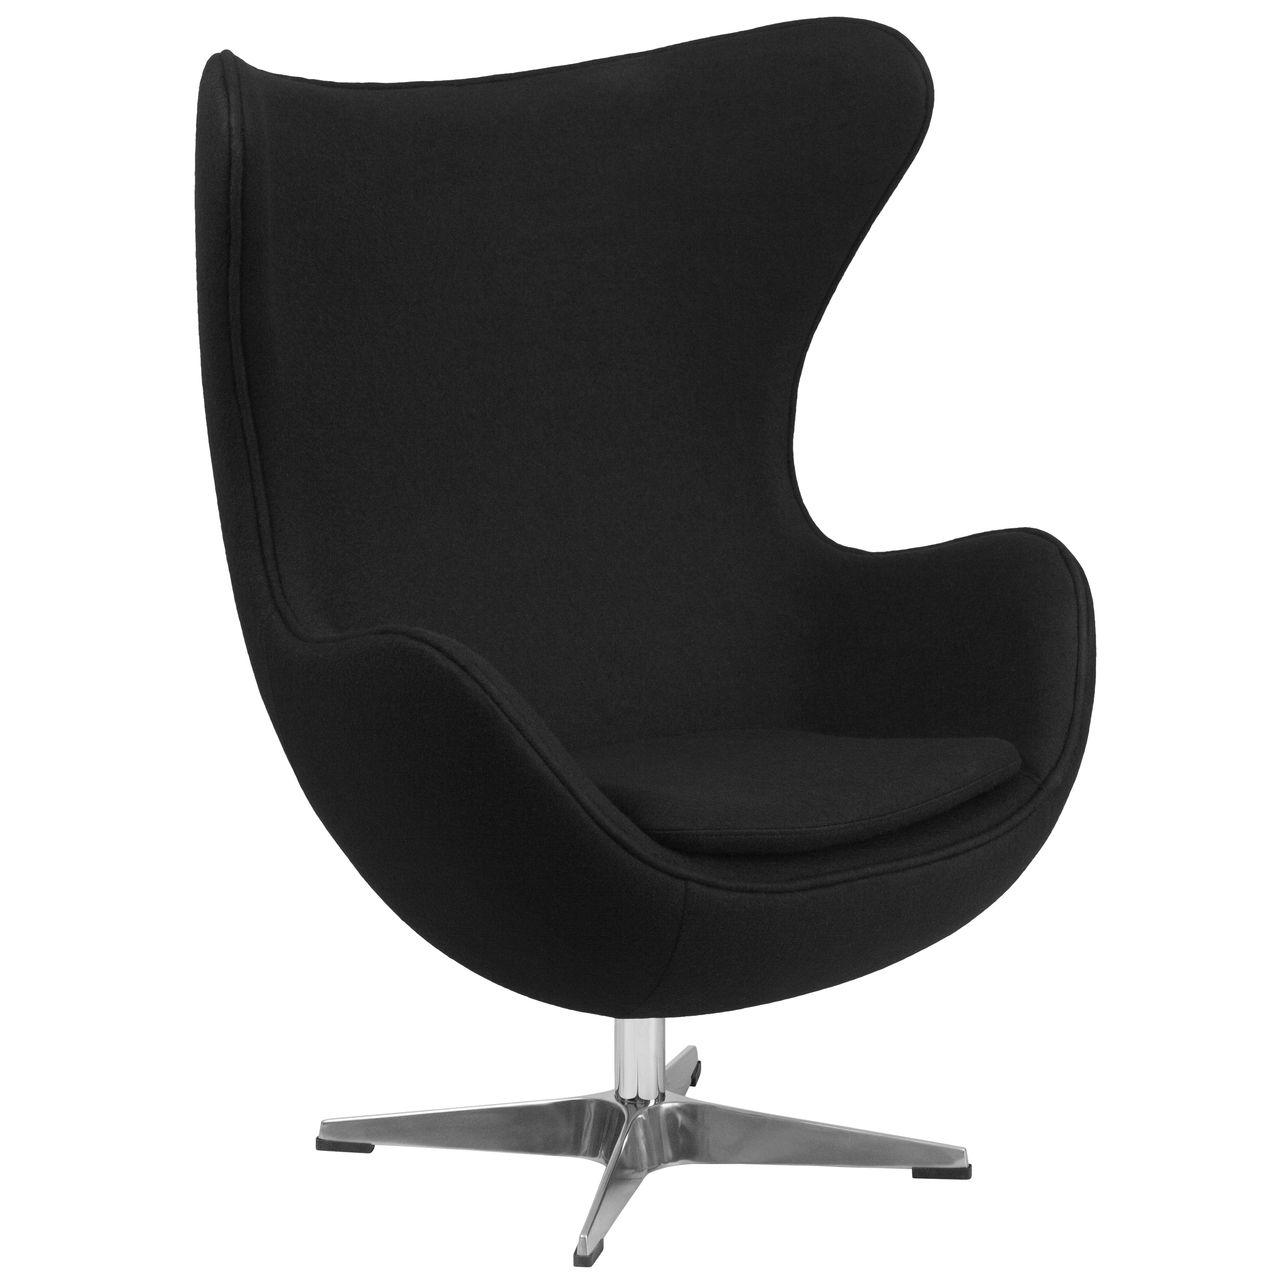 Black Wool Fabric Egg Chair with TiltLock Mechanism HOME DECOR